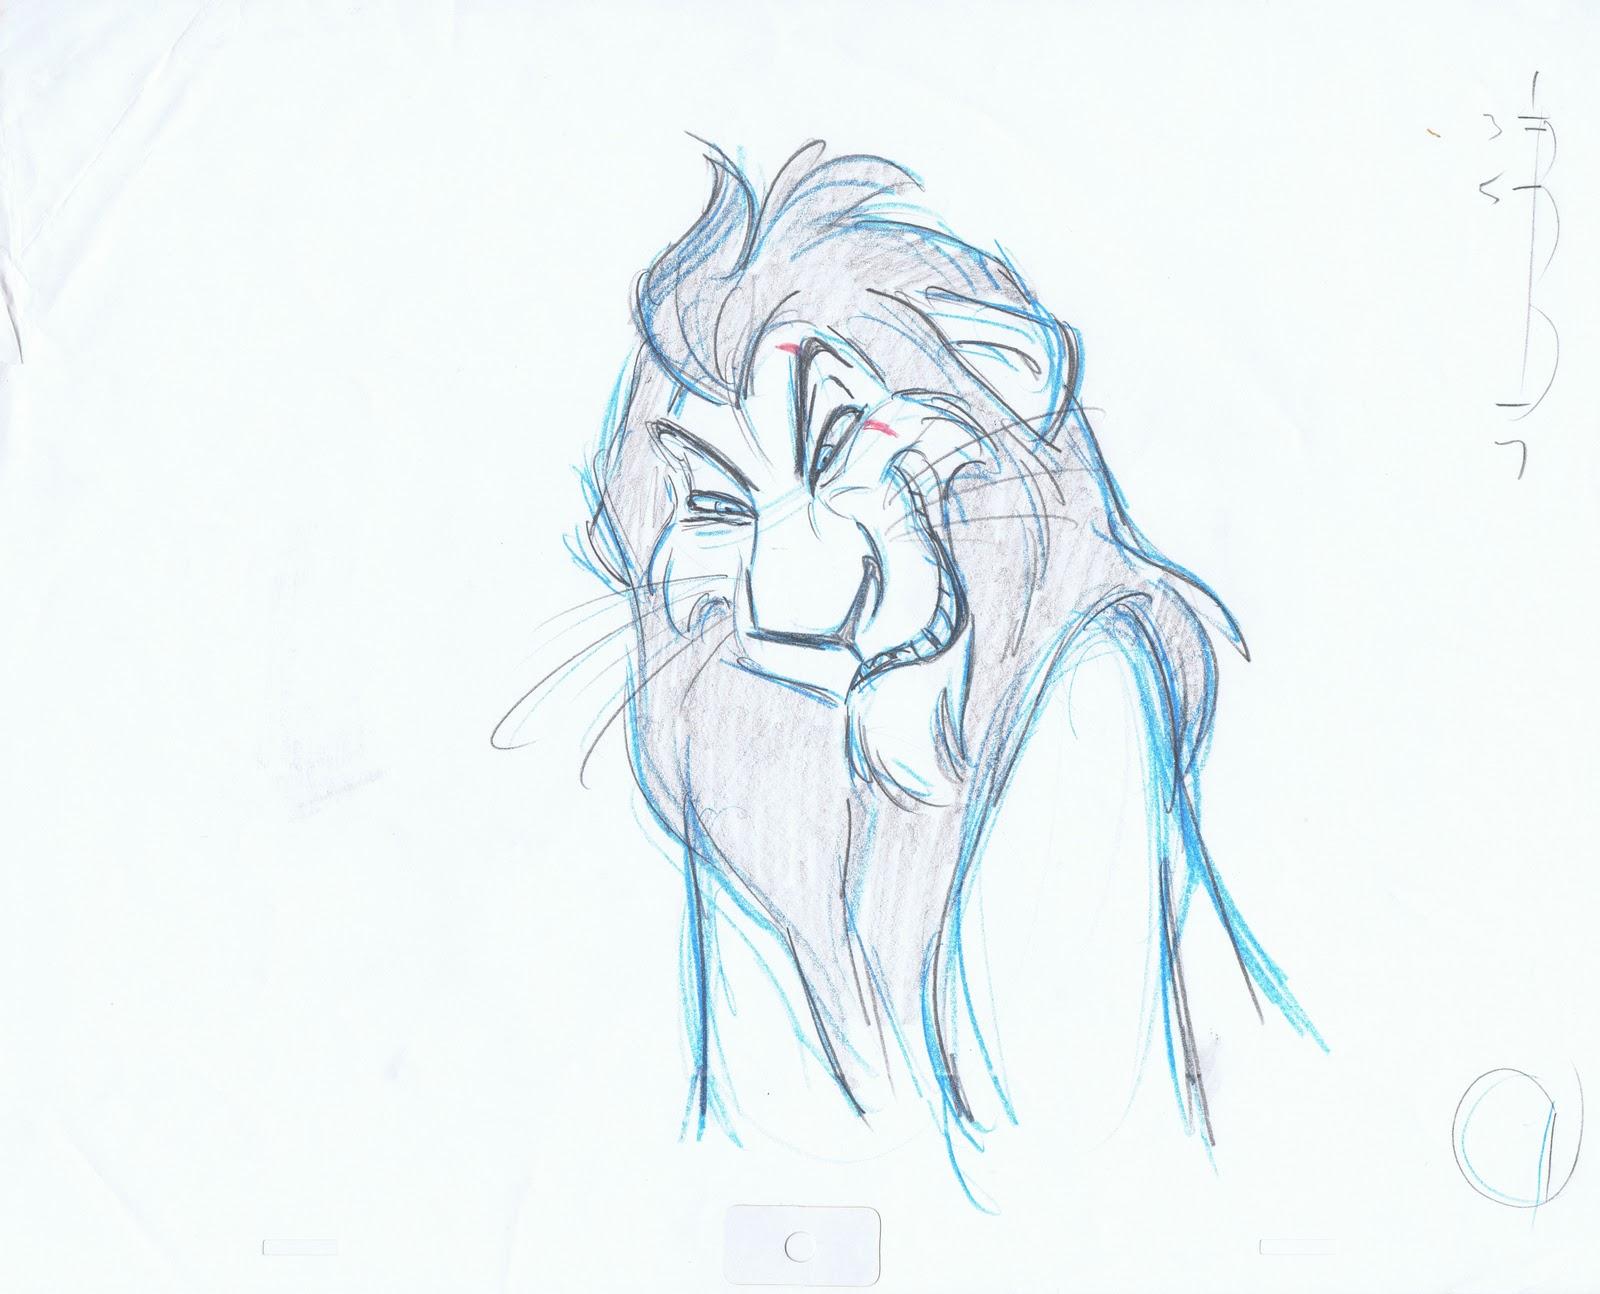 Andreas Deja, el animador de Scar. Jshdup